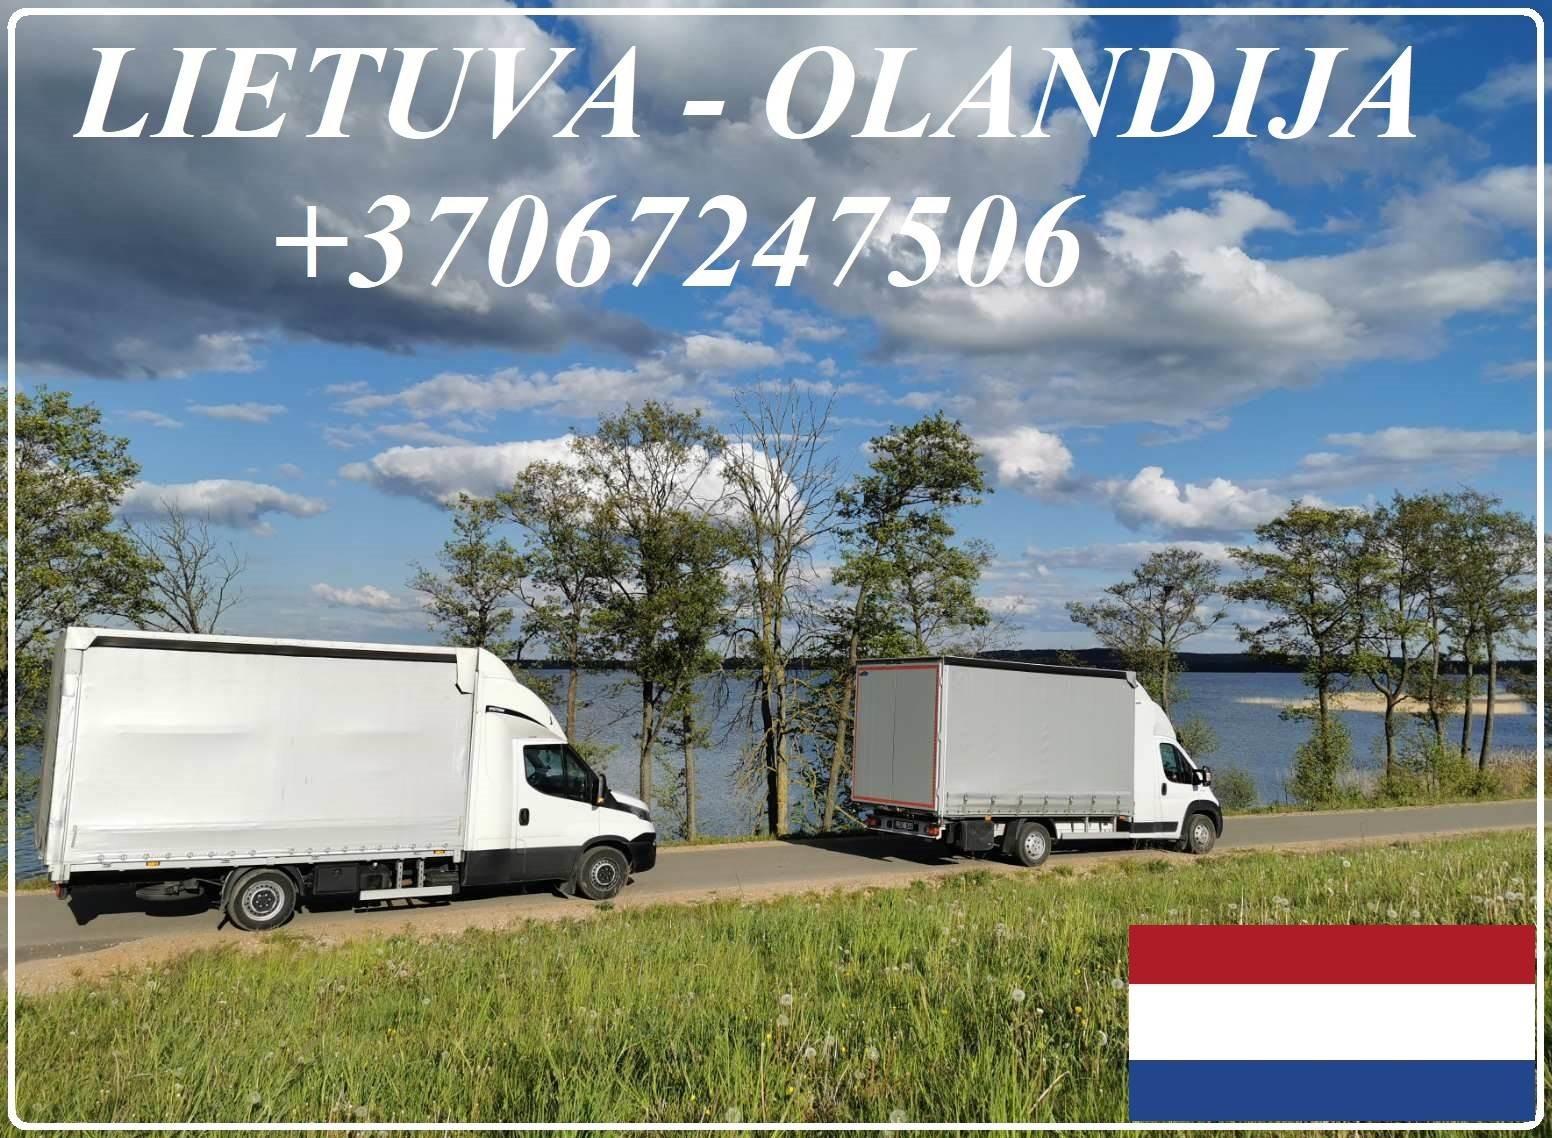 Kroviniai / Perkraustymas Lietuva - Olandija - Lietuva